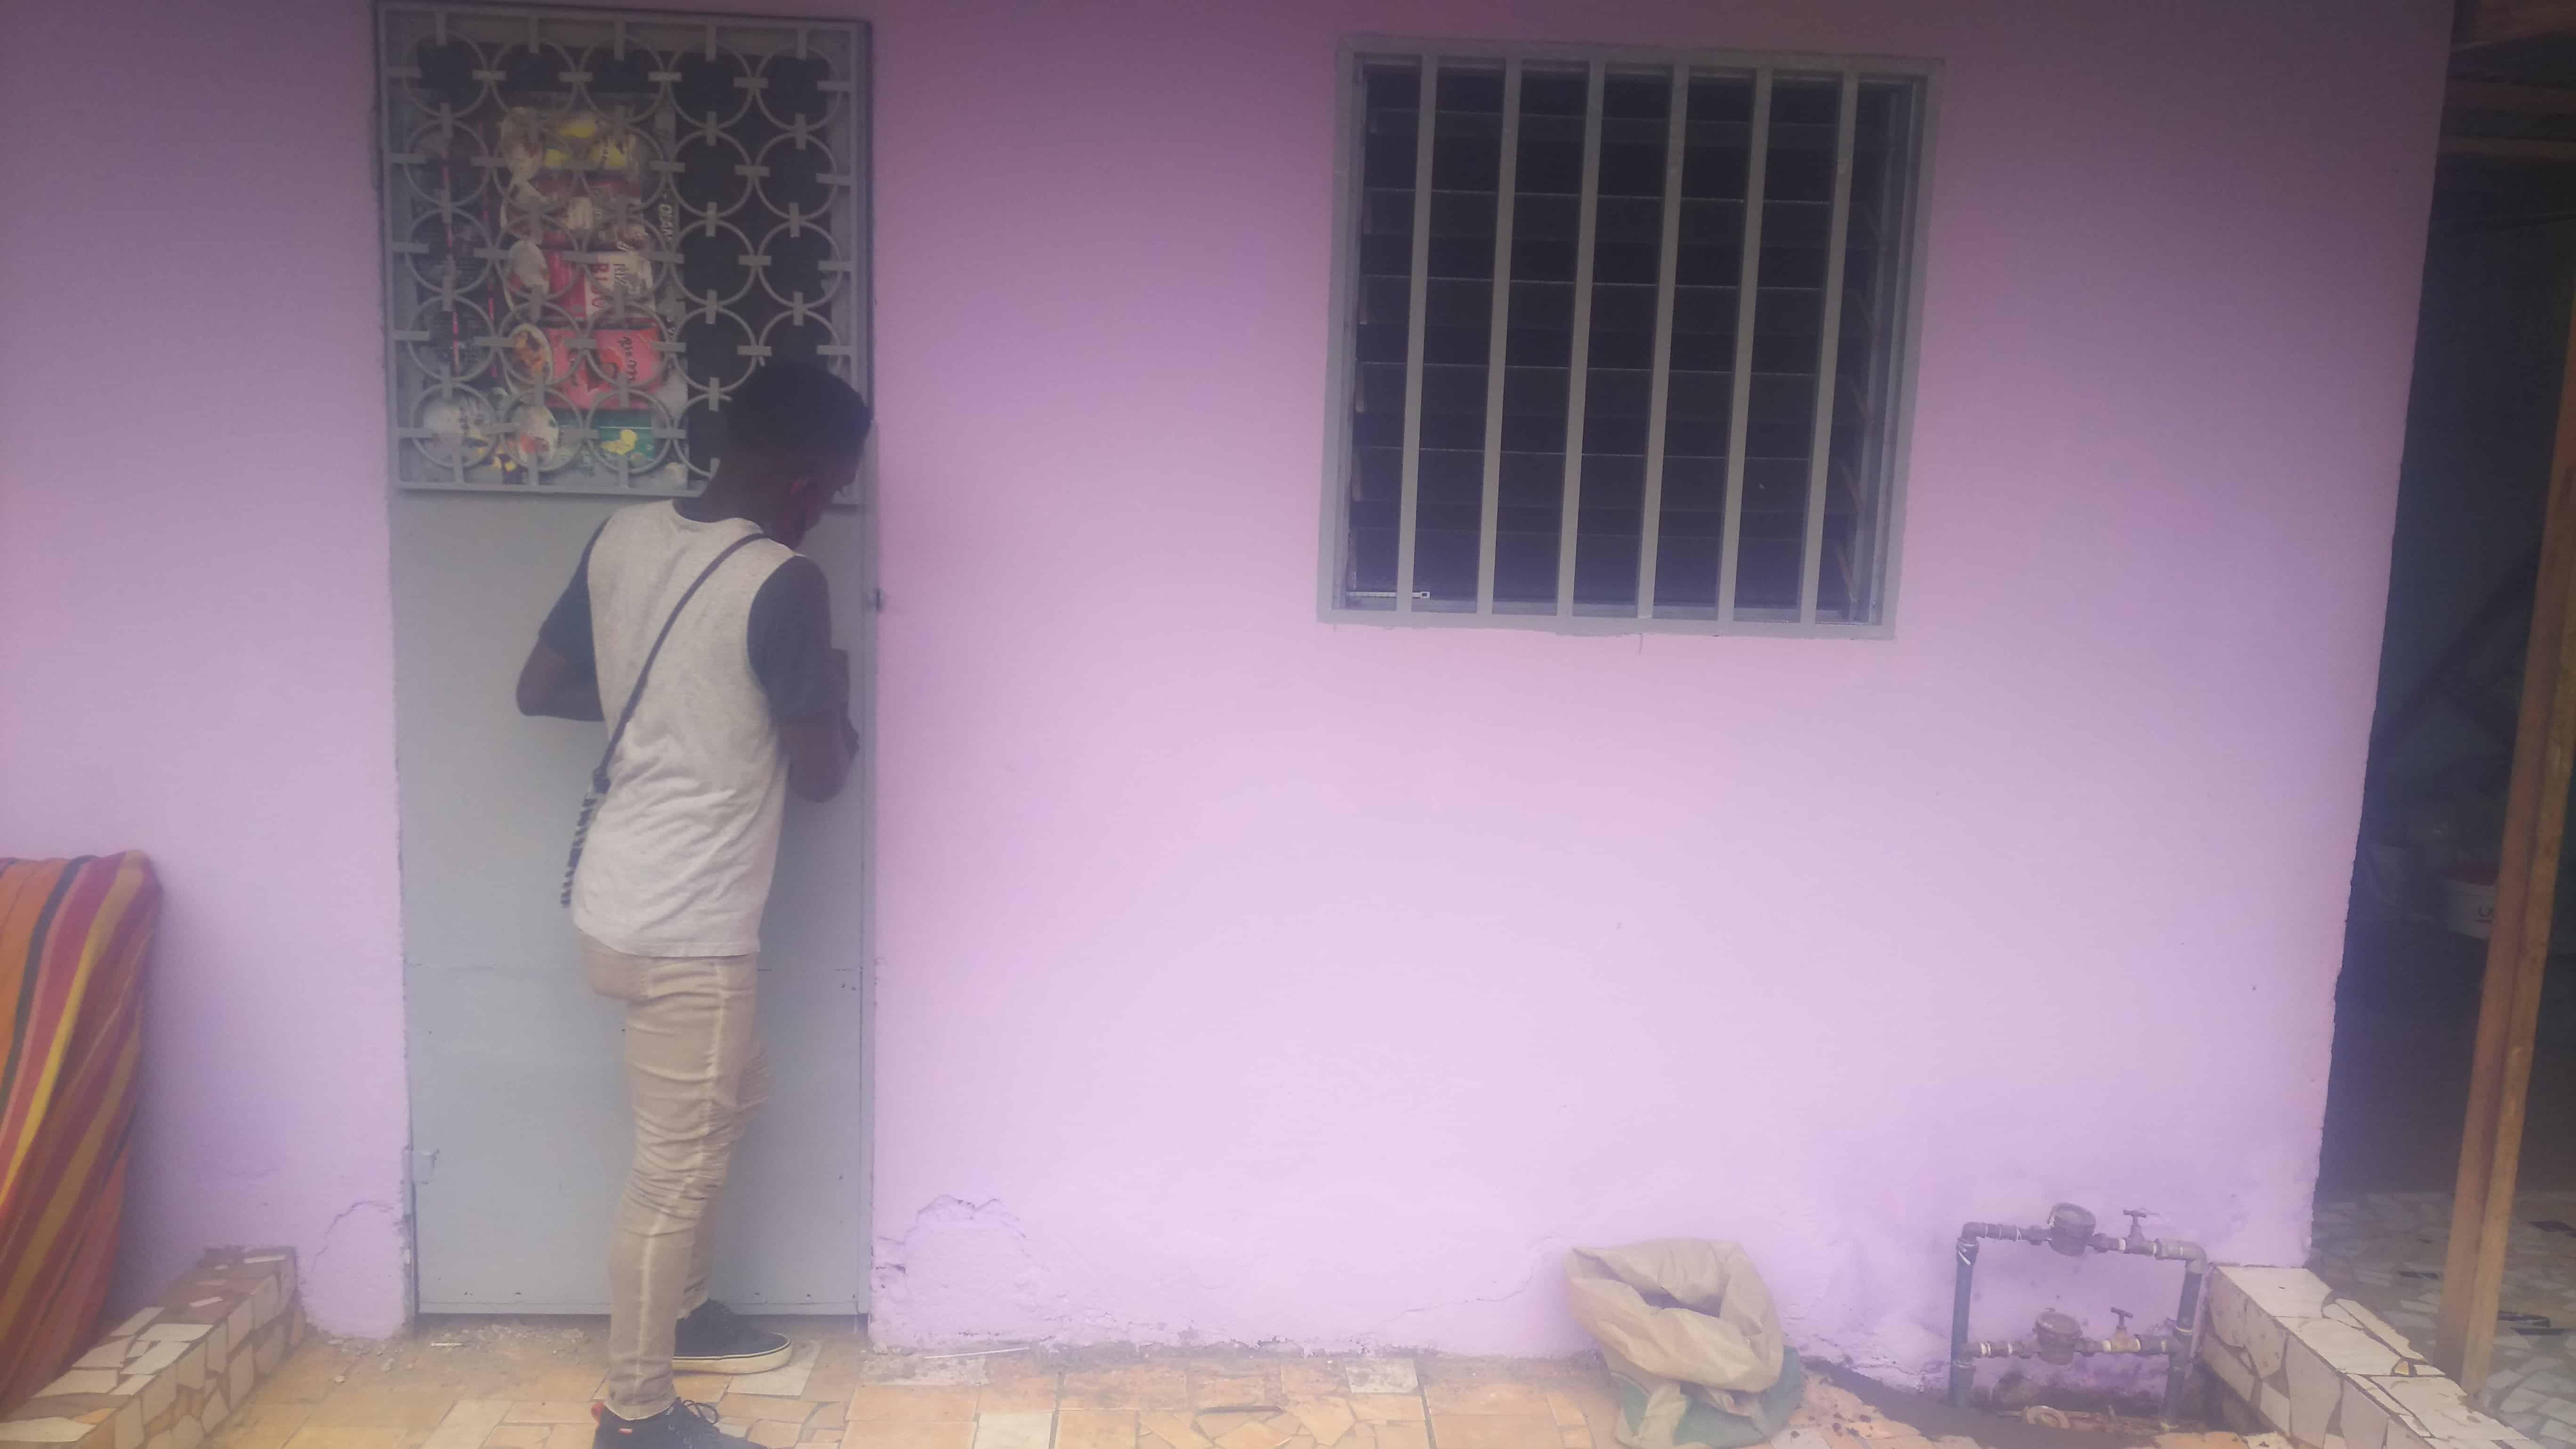 Studio to rent - Douala, Ndogbong, Entrée IUT - 30 000 FCFA / month